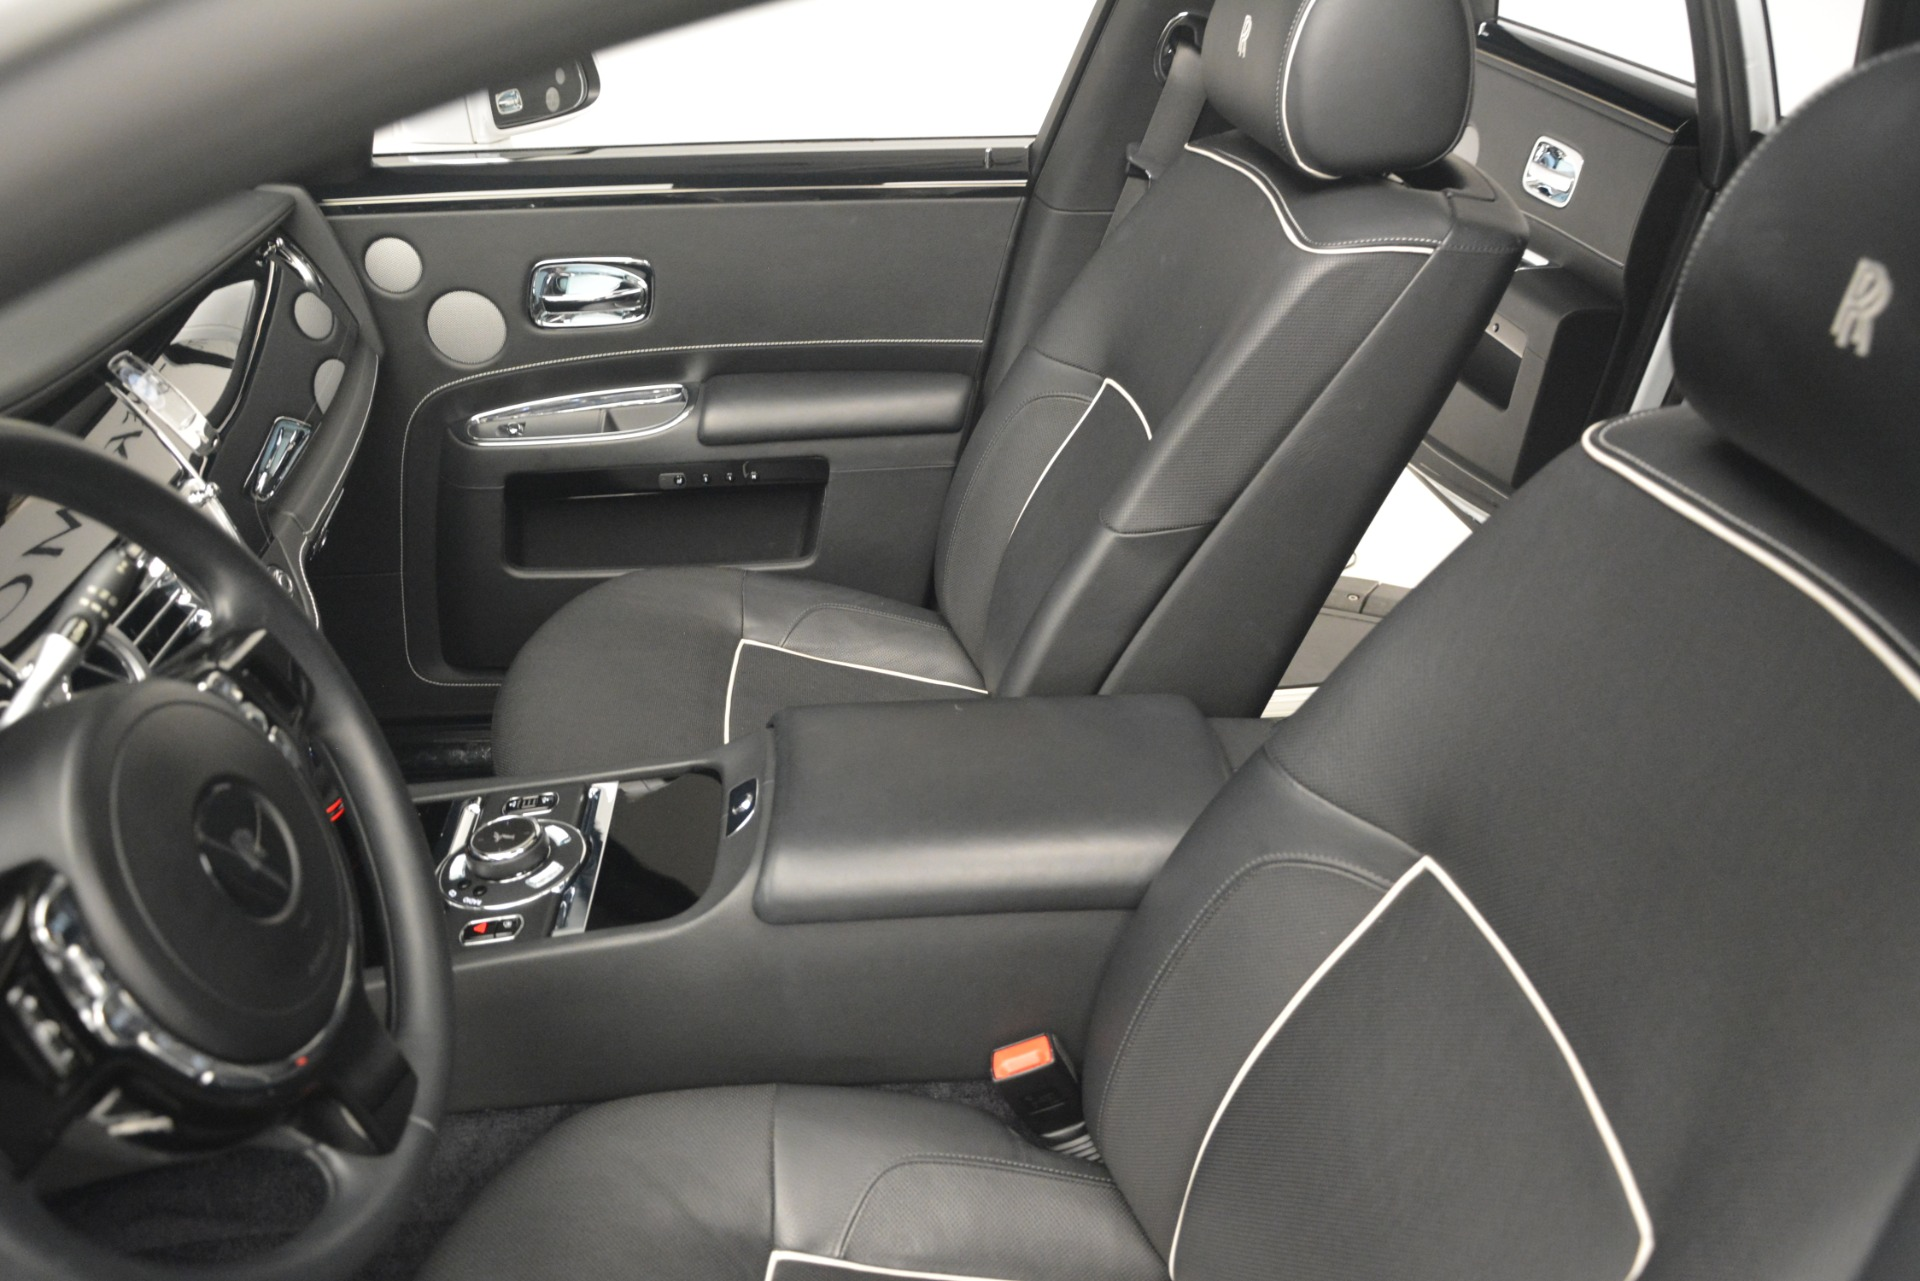 Used 2014 Rolls-Royce Ghost V-Spec For Sale In Westport, CT 2989_p17